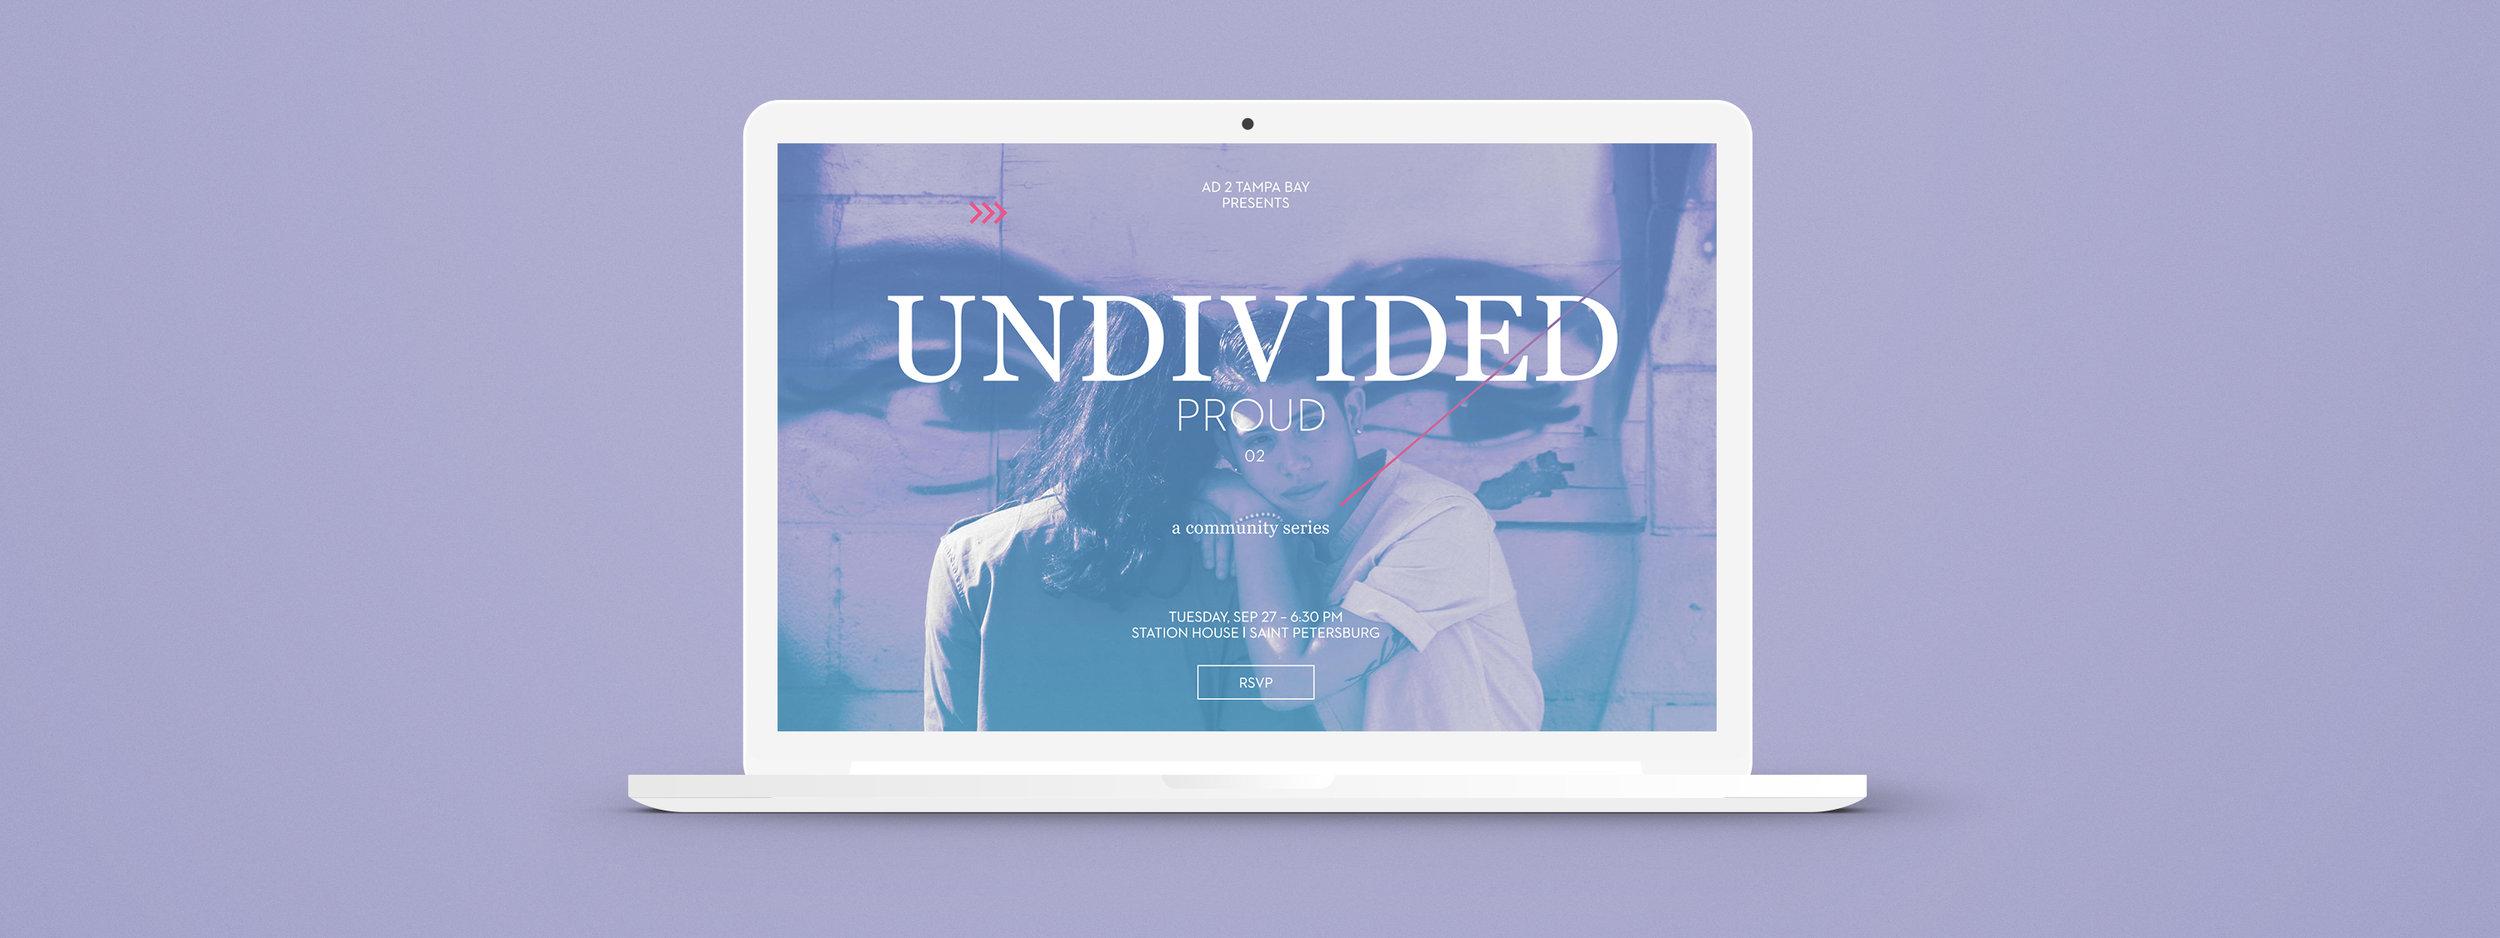 undivided_2.jpg